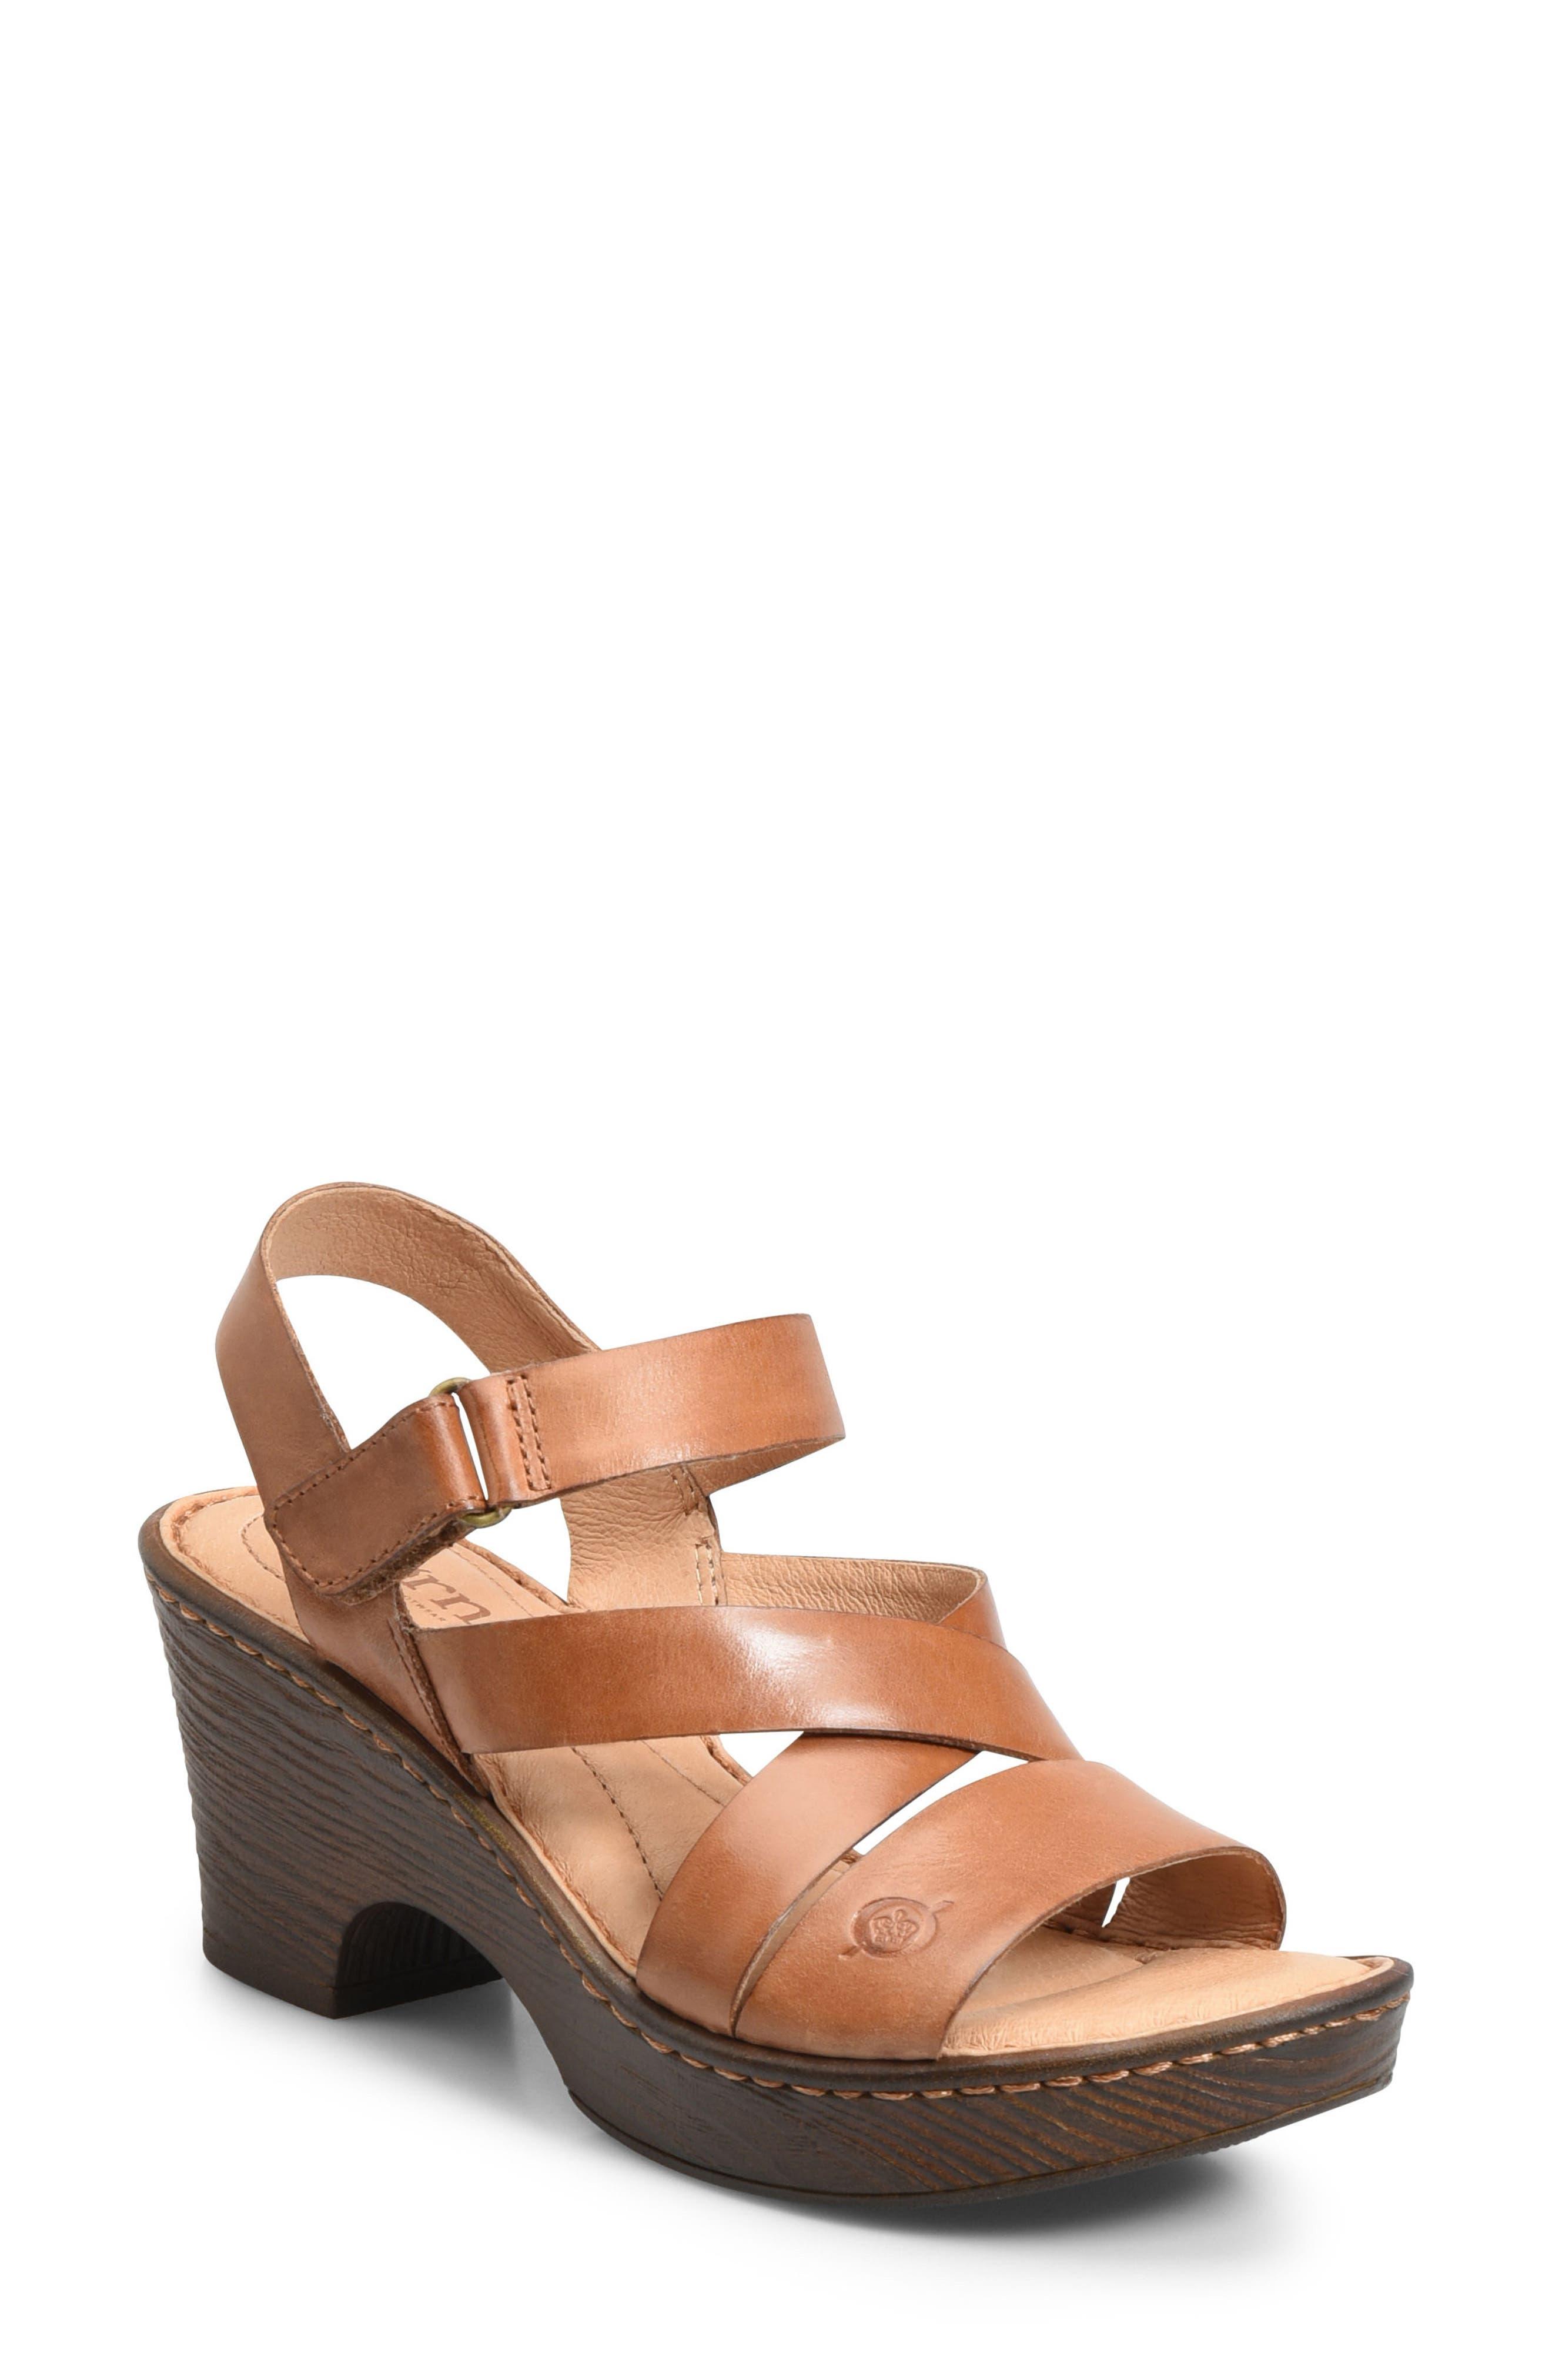 Cubera Platform Sandal,                         Main,                         color, Brown Leather